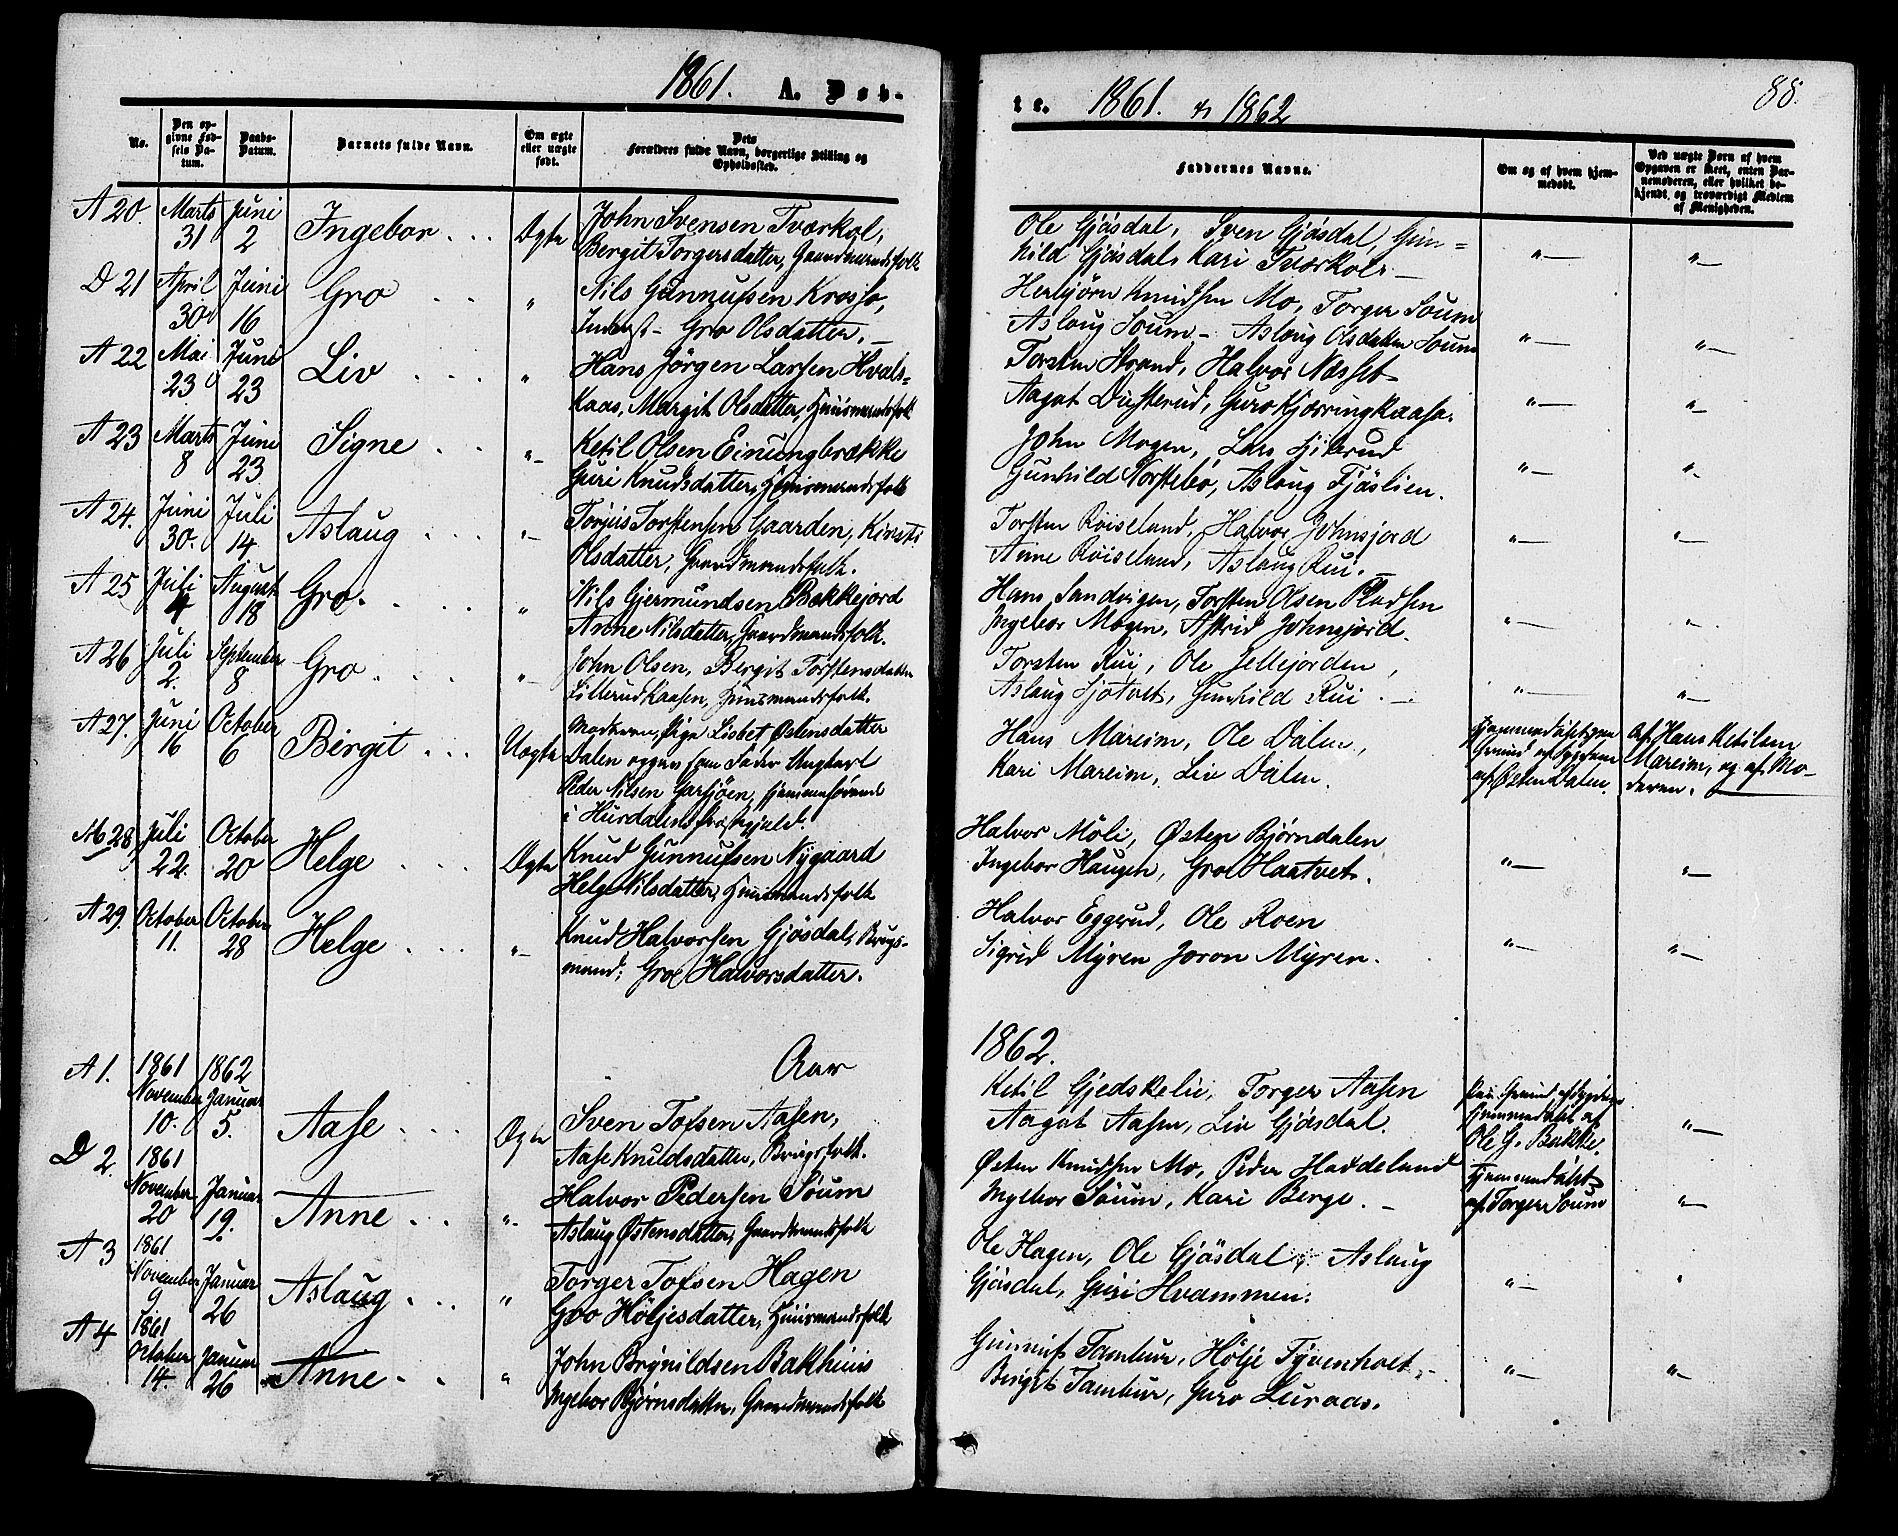 SAKO, Tinn kirkebøker, F/Fa/L0006: Ministerialbok nr. I 6, 1857-1878, s. 88